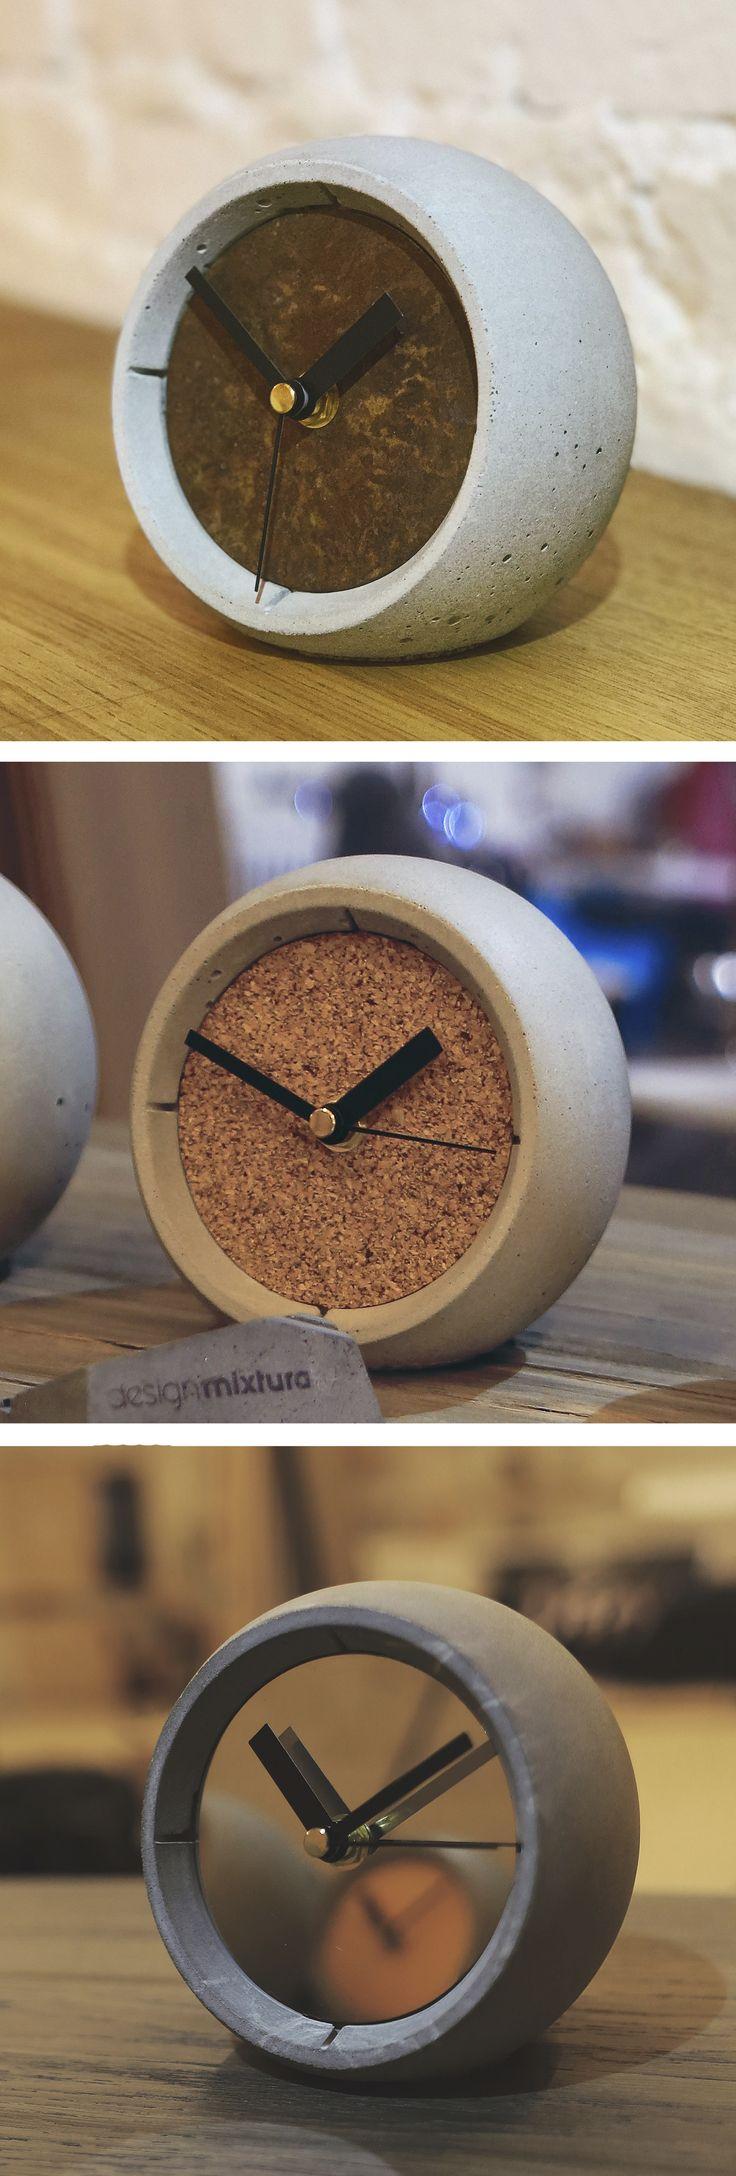 Concrete sphere watch